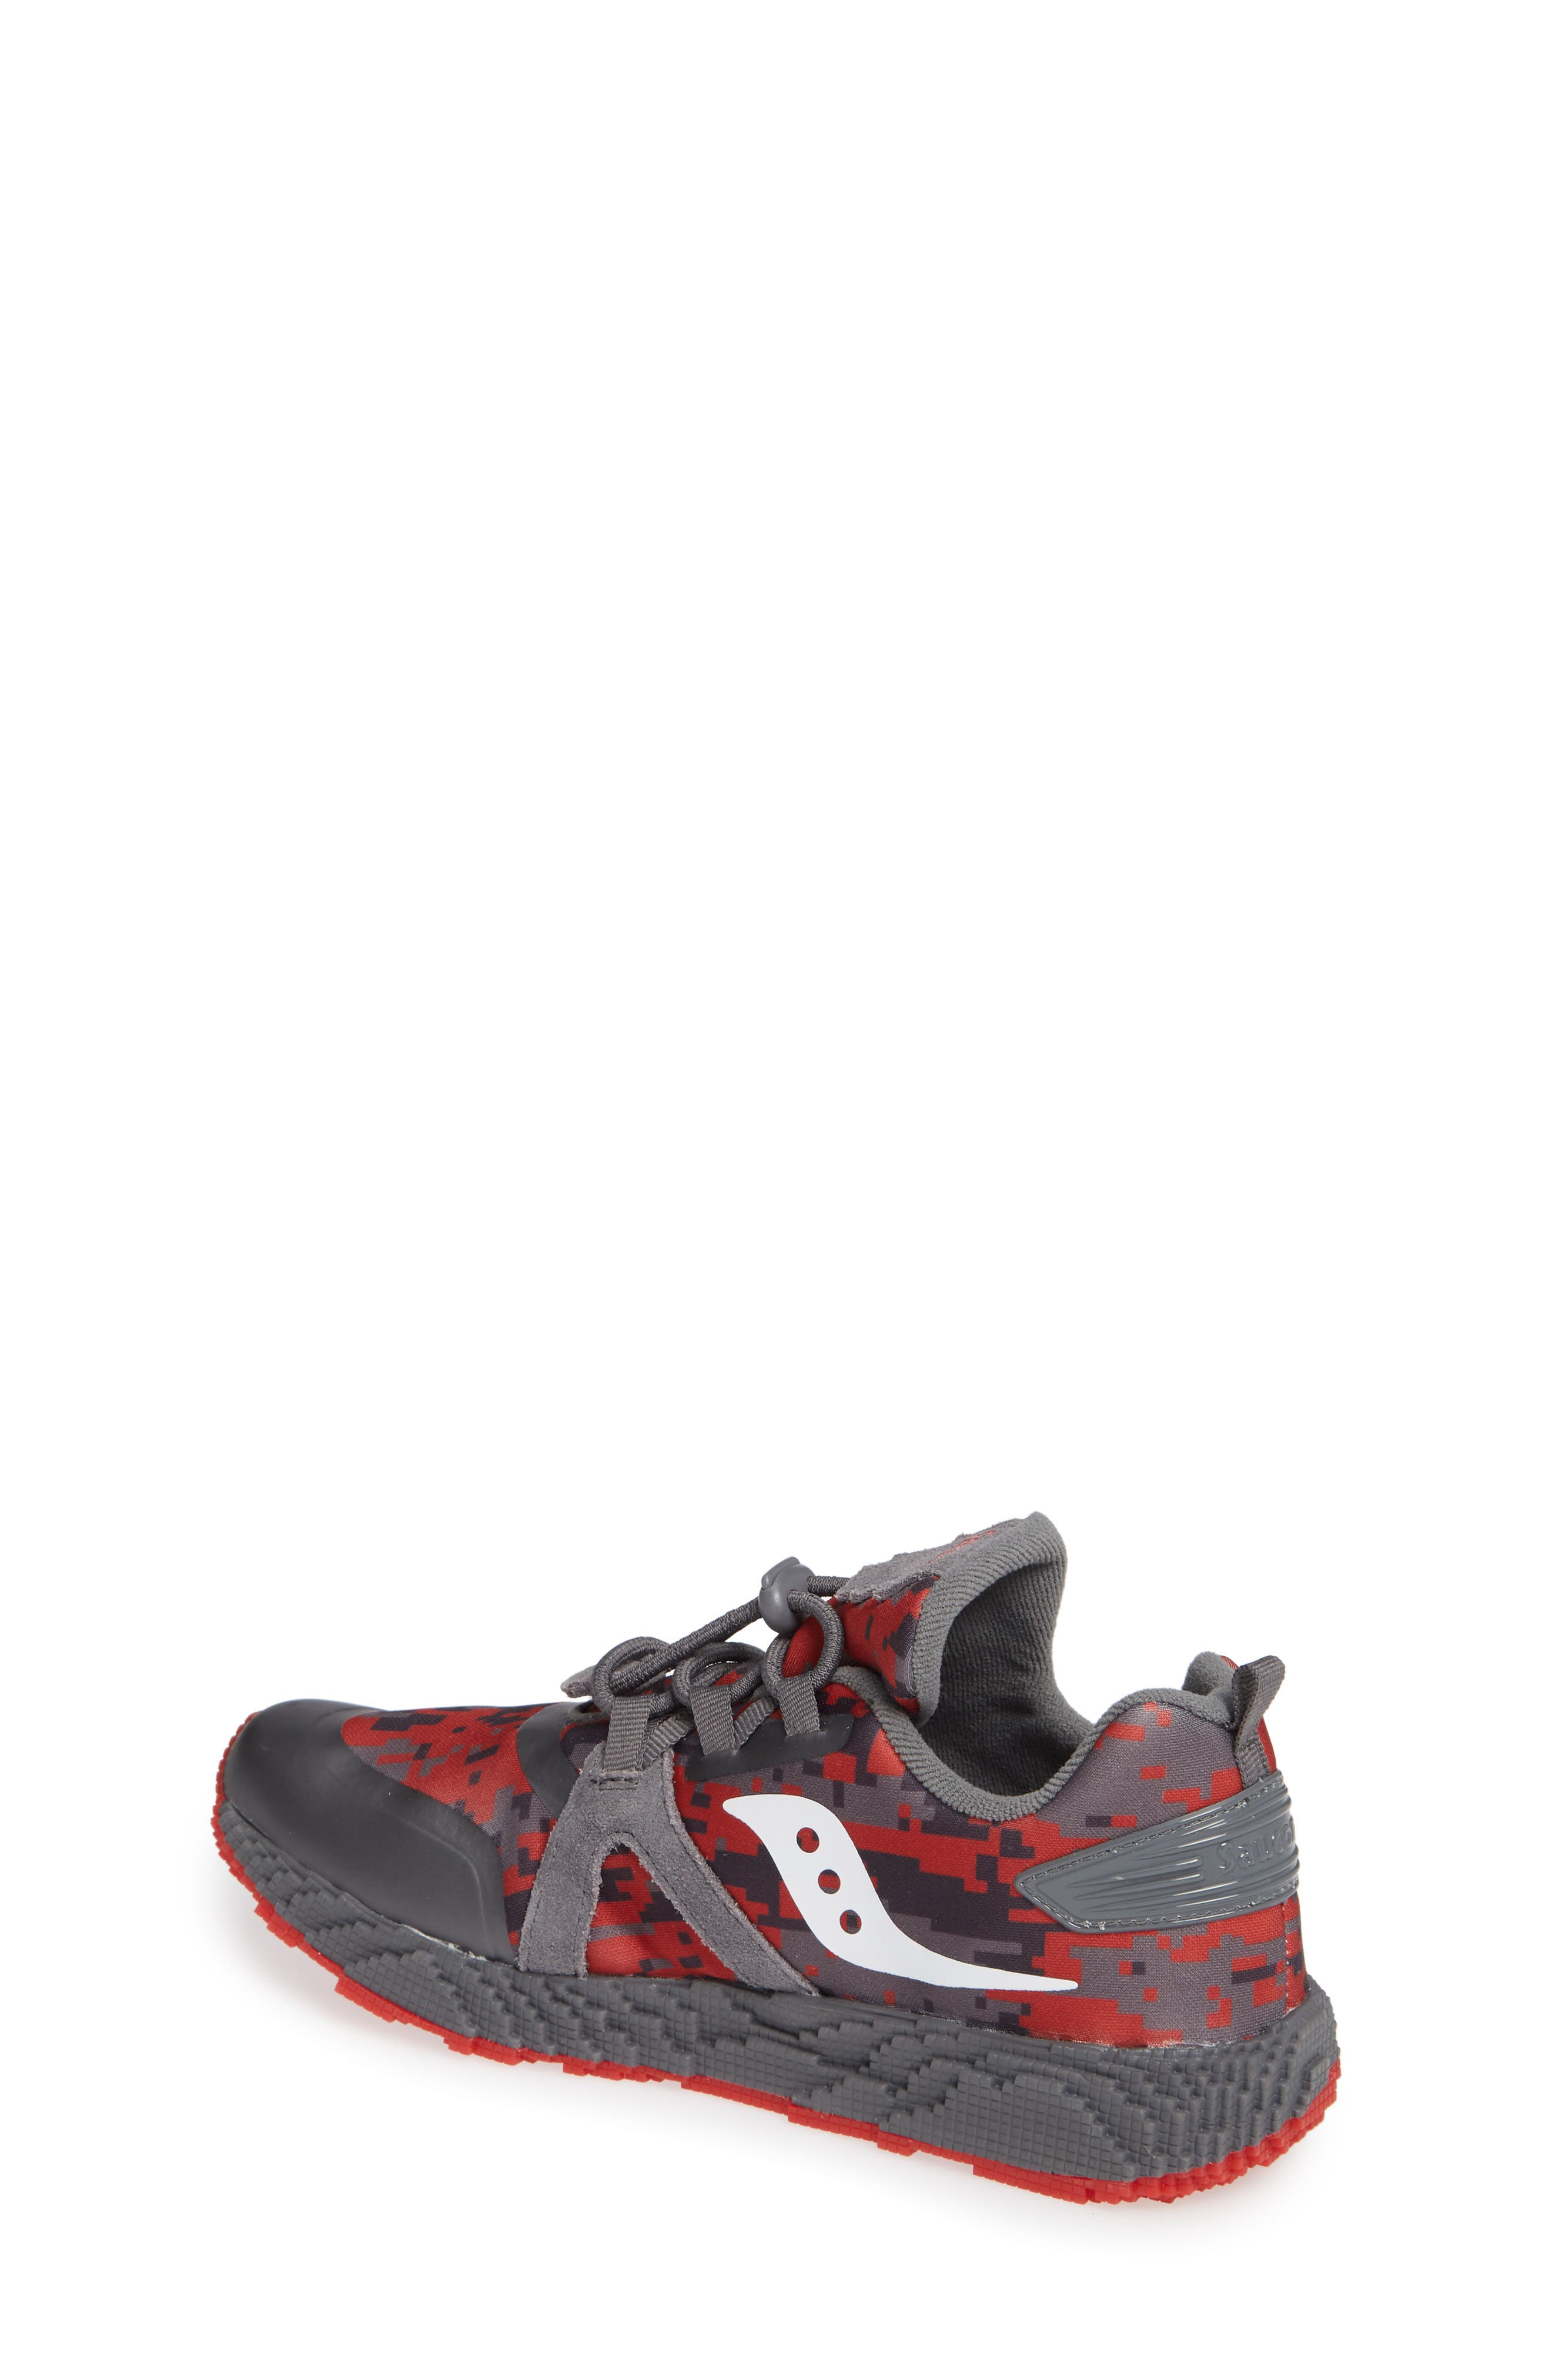 Voxel 9000 Sneaker,                             Alternate thumbnail 2, color,                             GREY LEATHER/ MESH 2